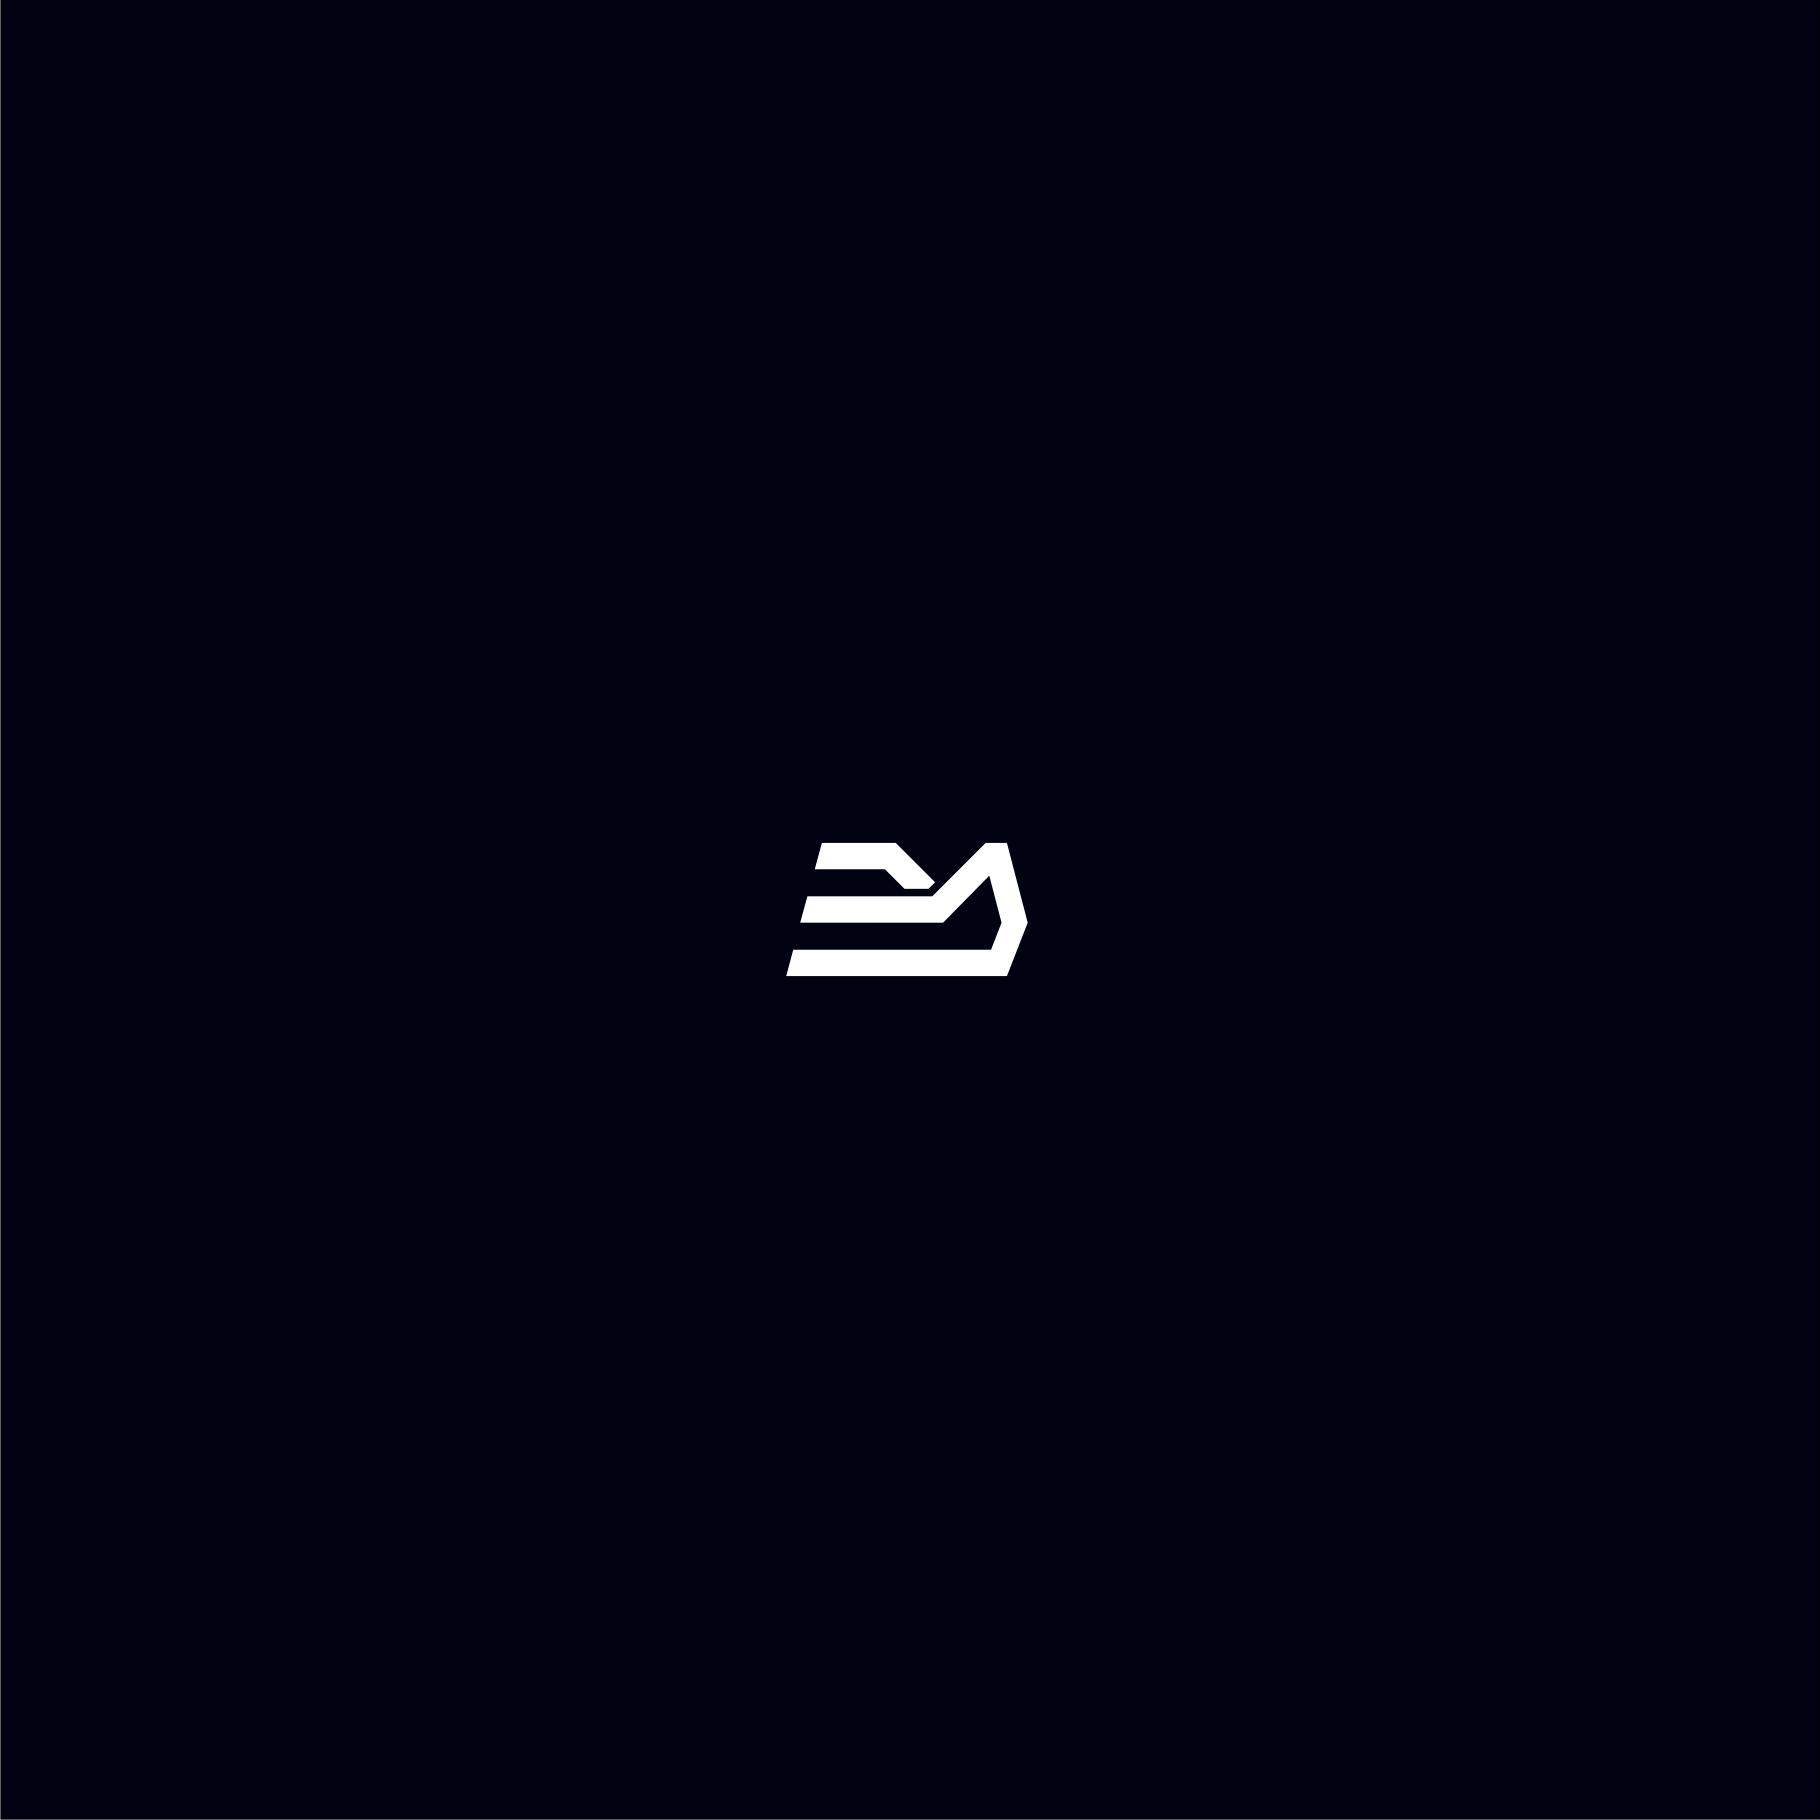 Логотип для новостного сайта  фото f_9235b6c195121913.png